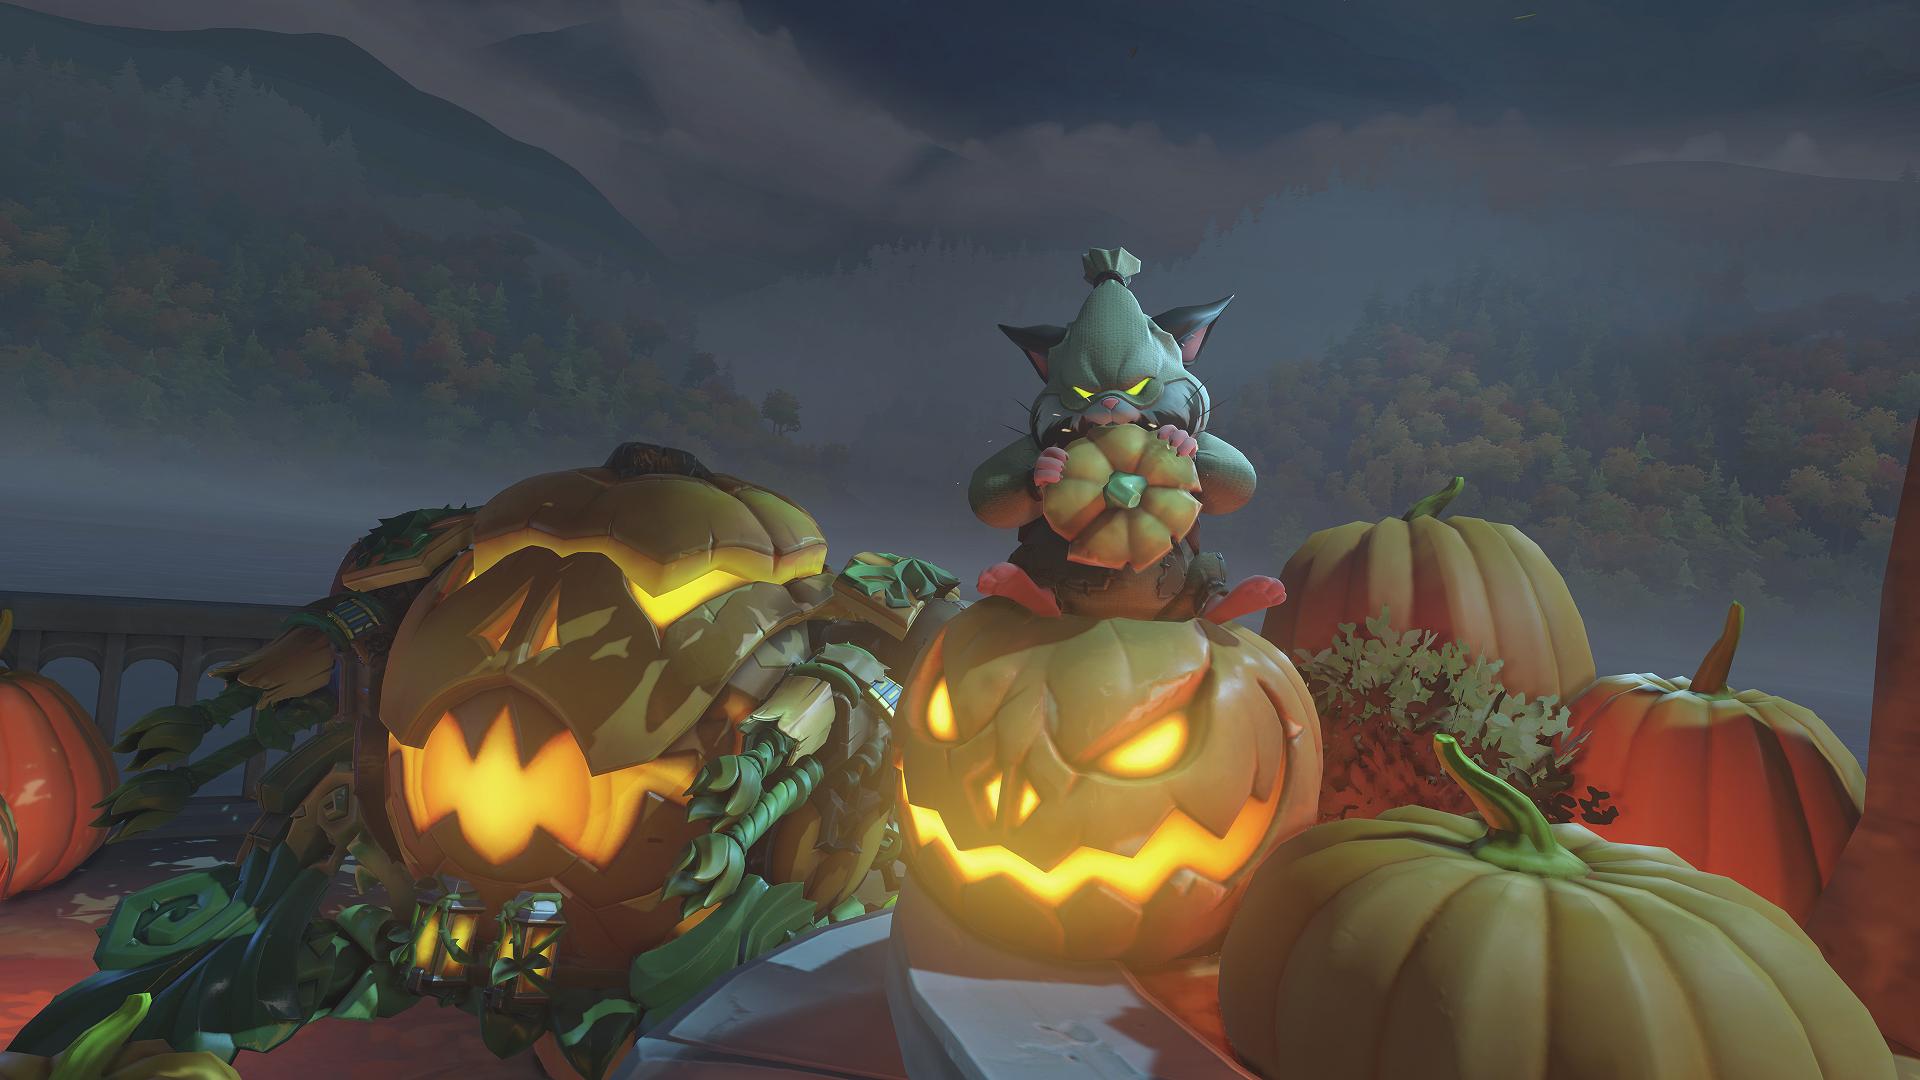 Here S Every Overwatch Halloween Terror Skin In One